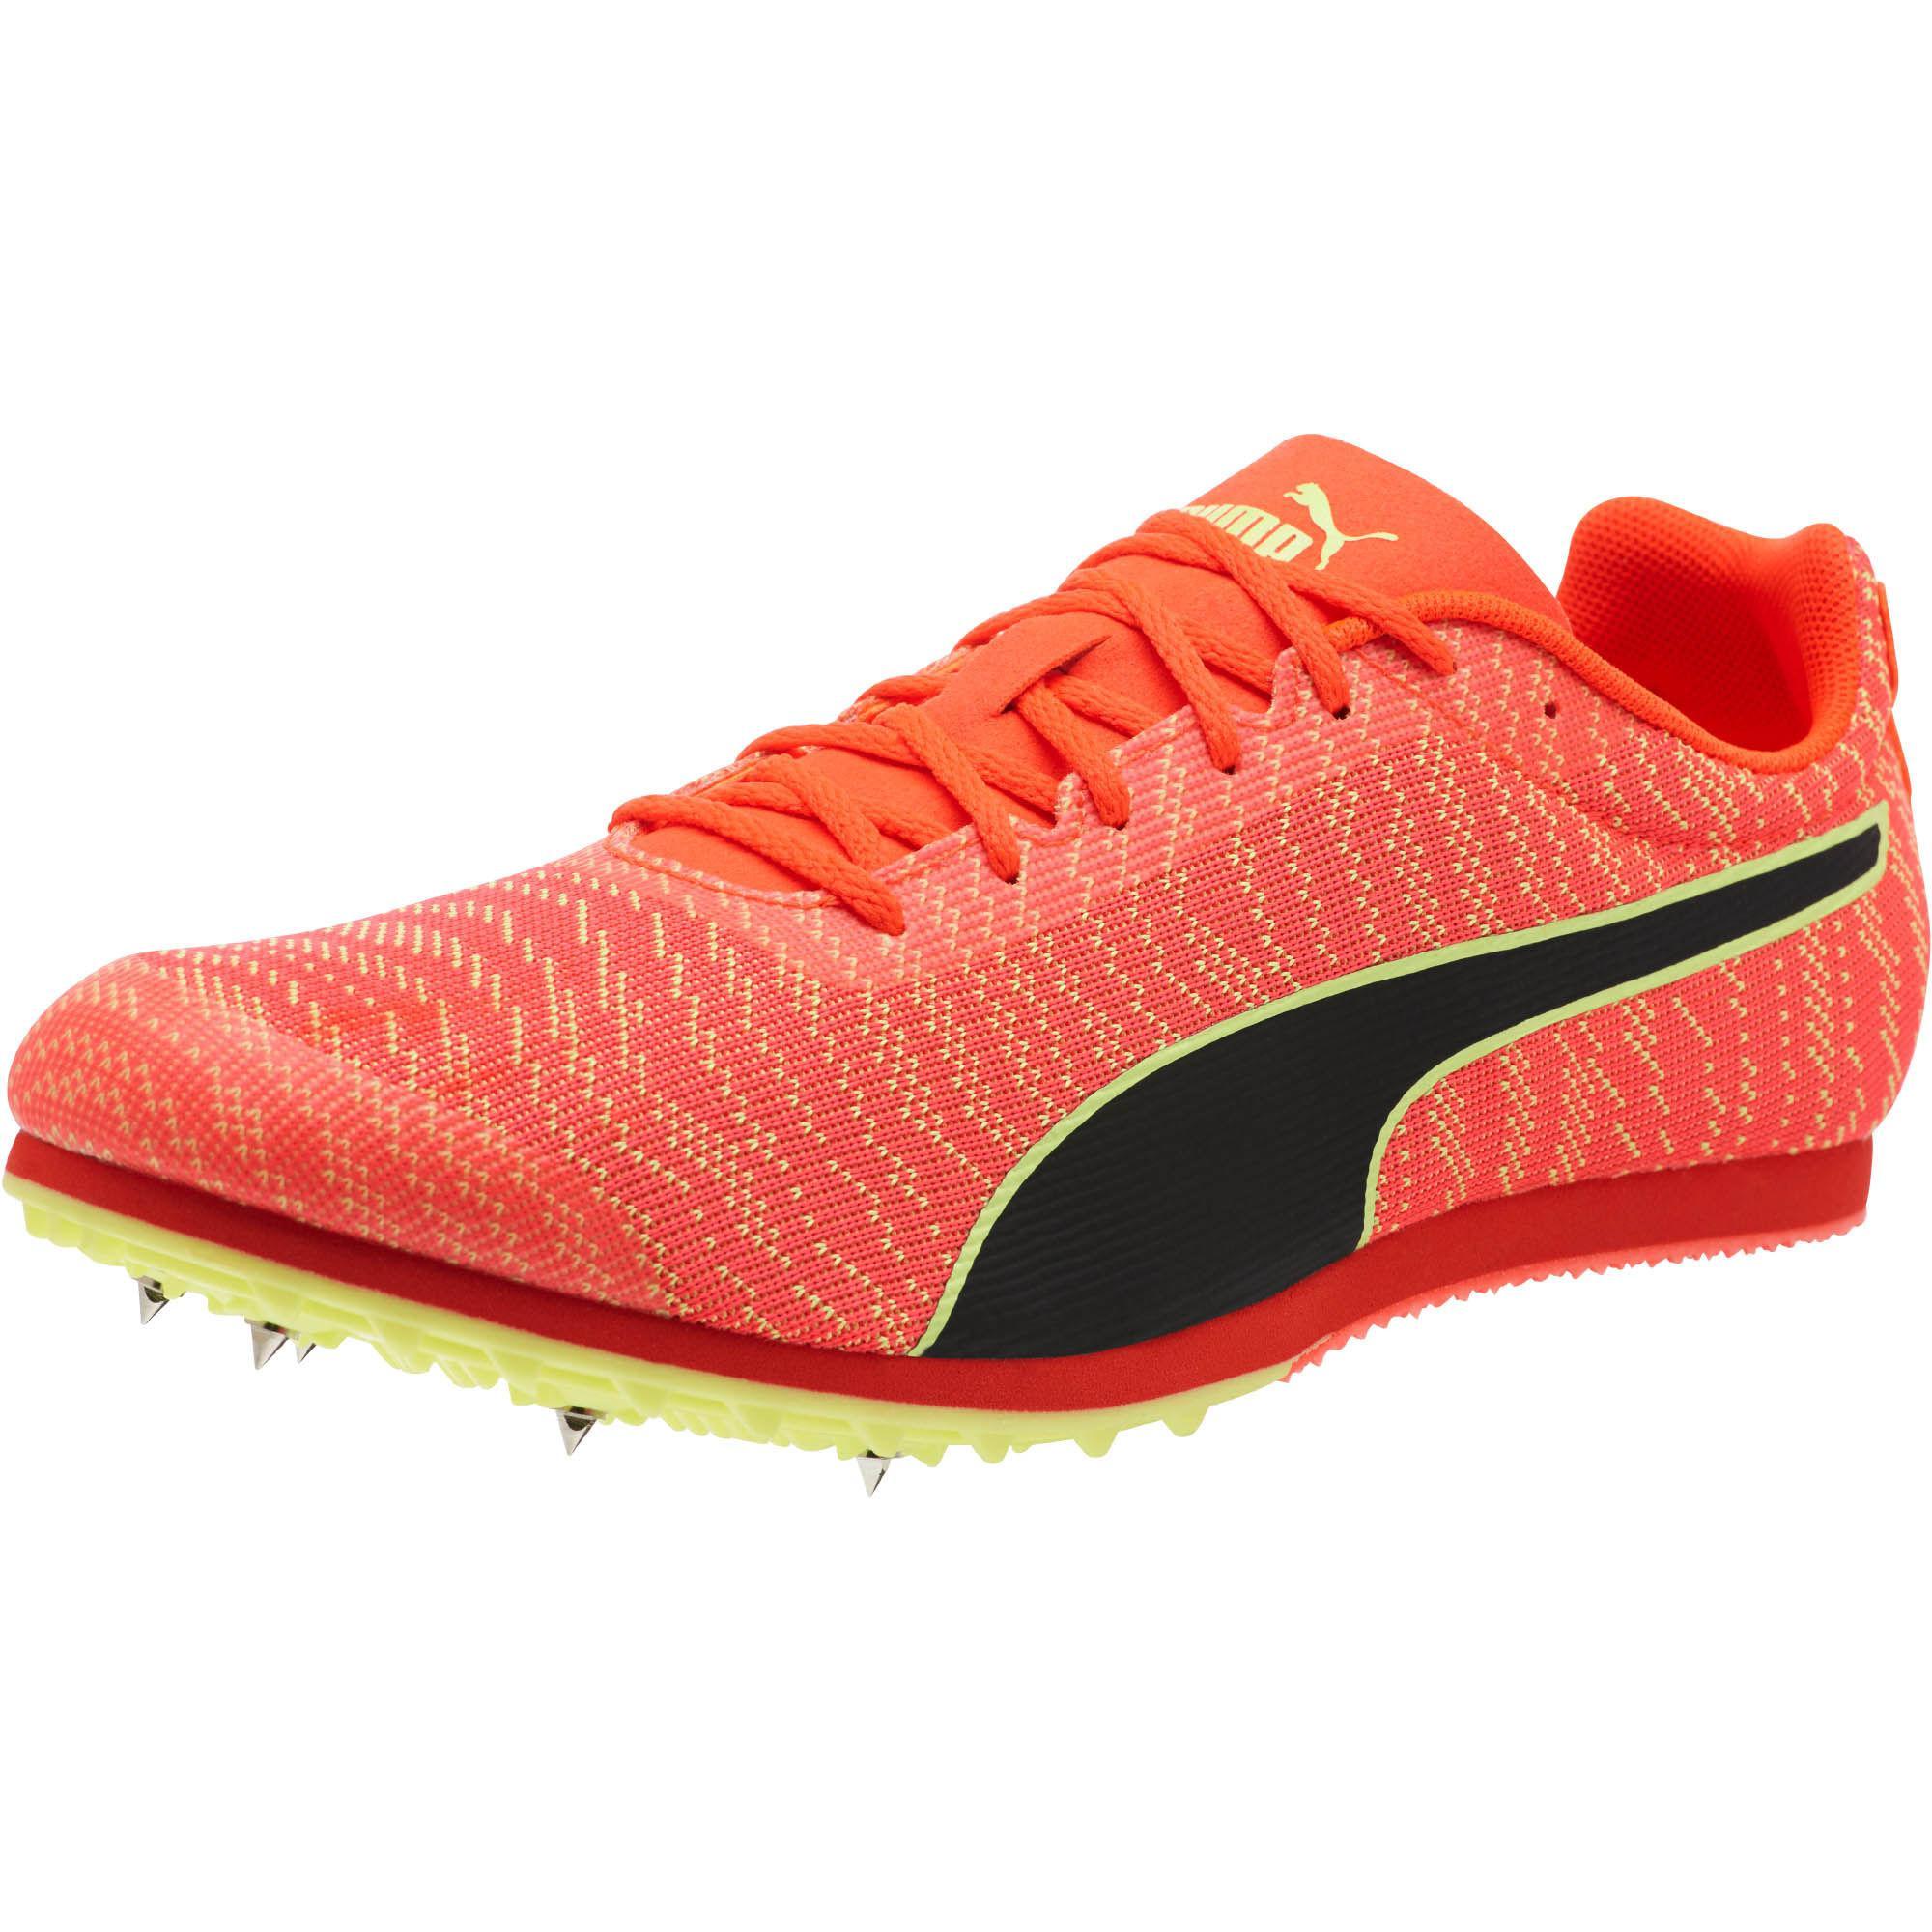 3b1161c709e4 Lyst - PUMA Evospeed Star 6 Men s Track Spikes in Red for Men